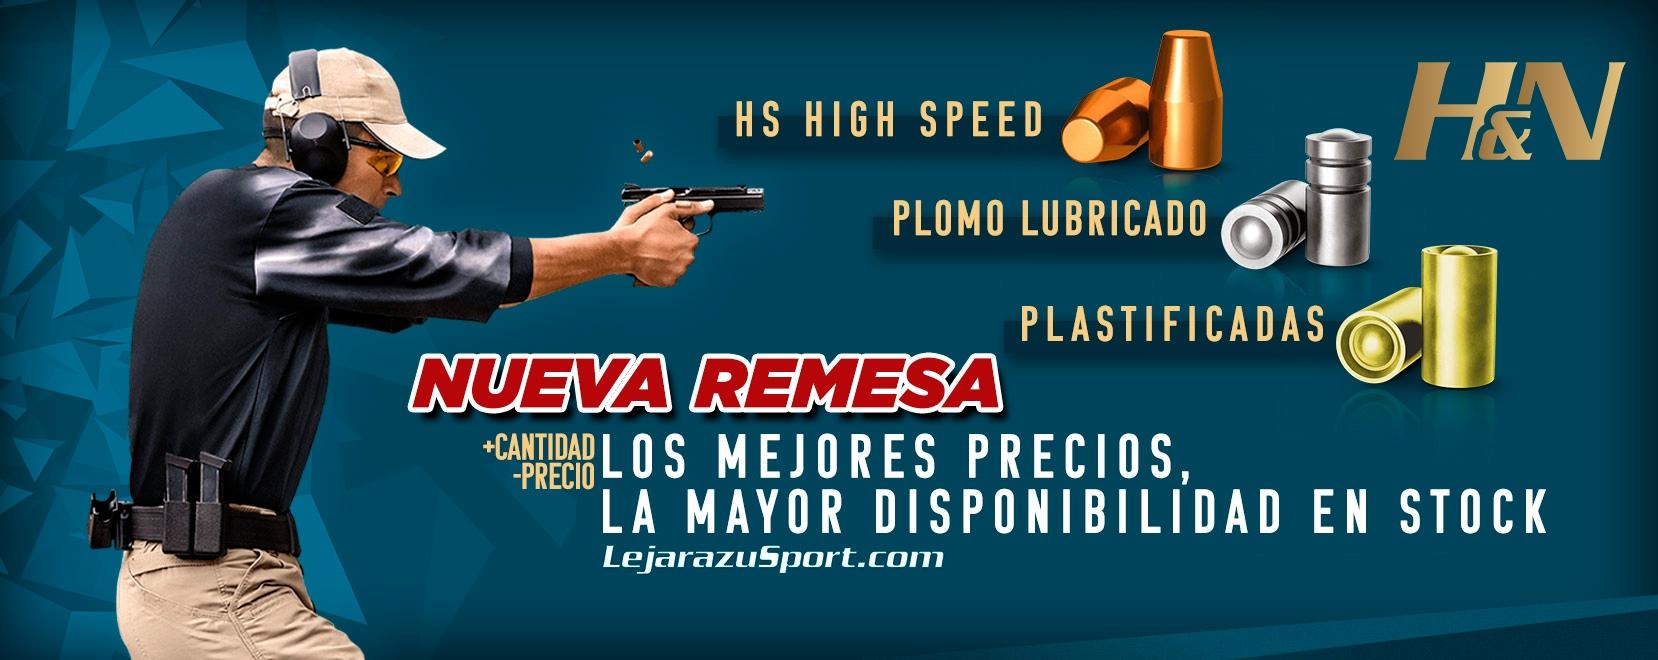 Nueva remesa de Puntas H&N Sport en LejarazuSport.com